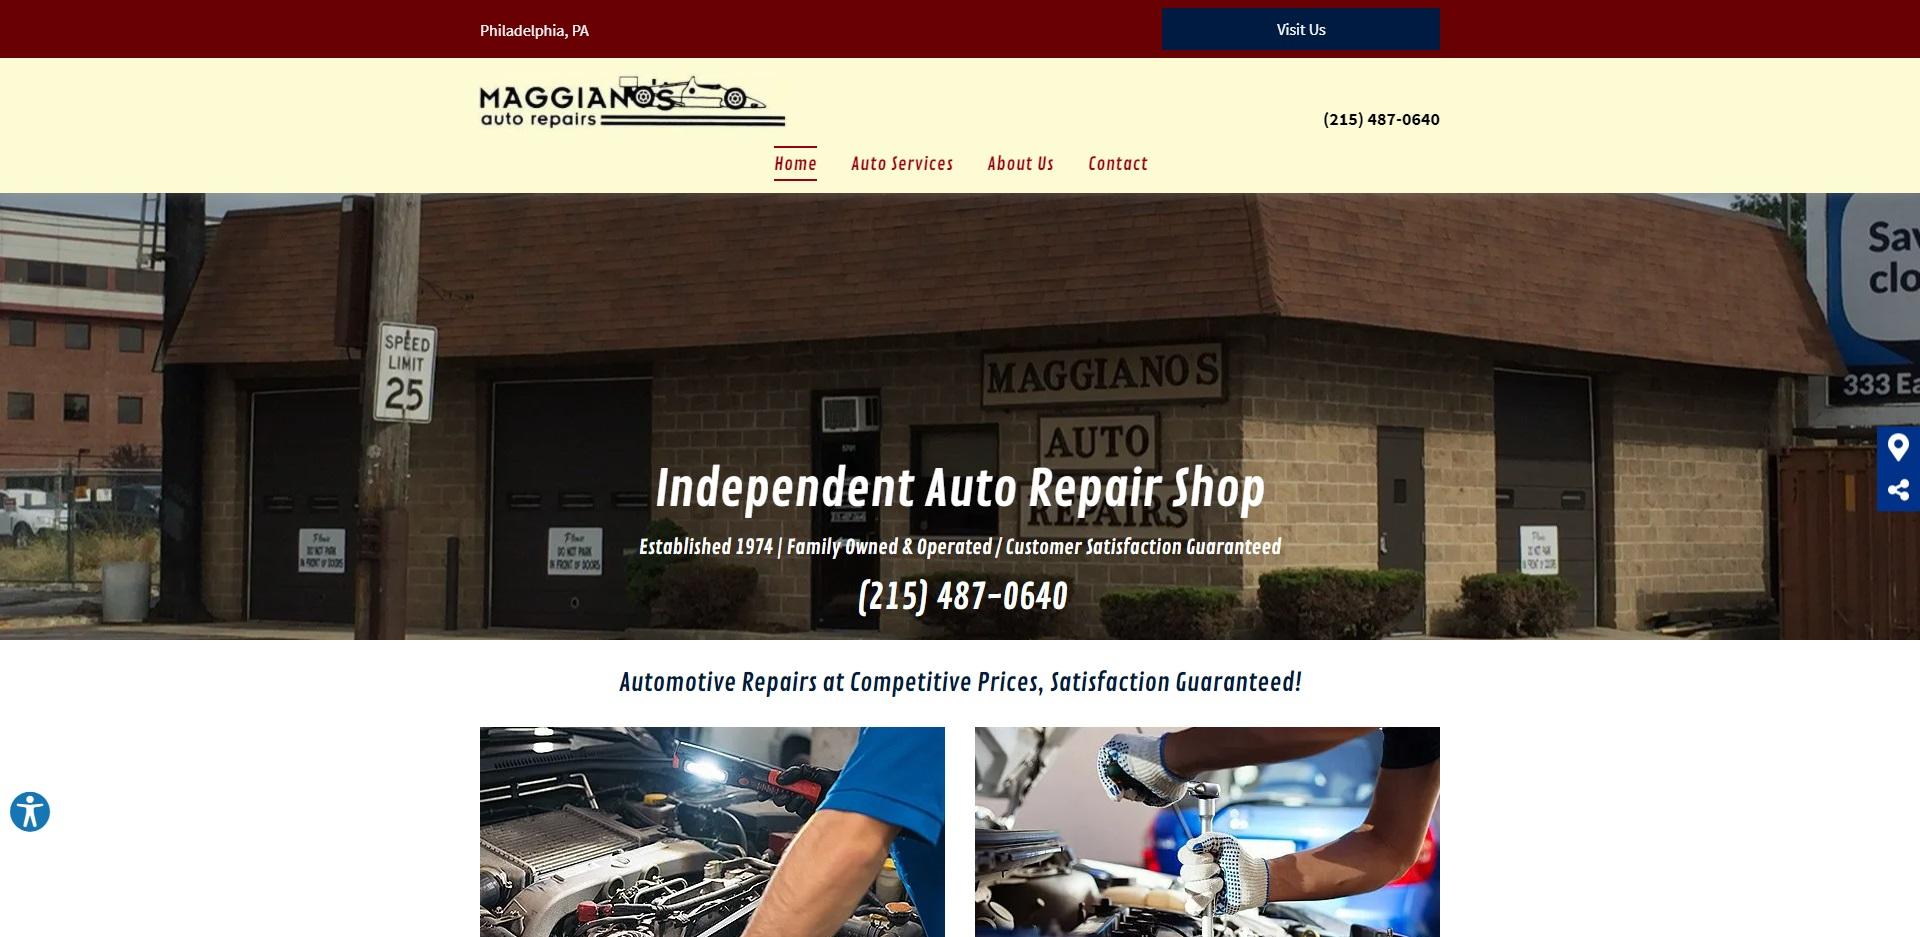 The Best Mechanic Shops in Philadelphia